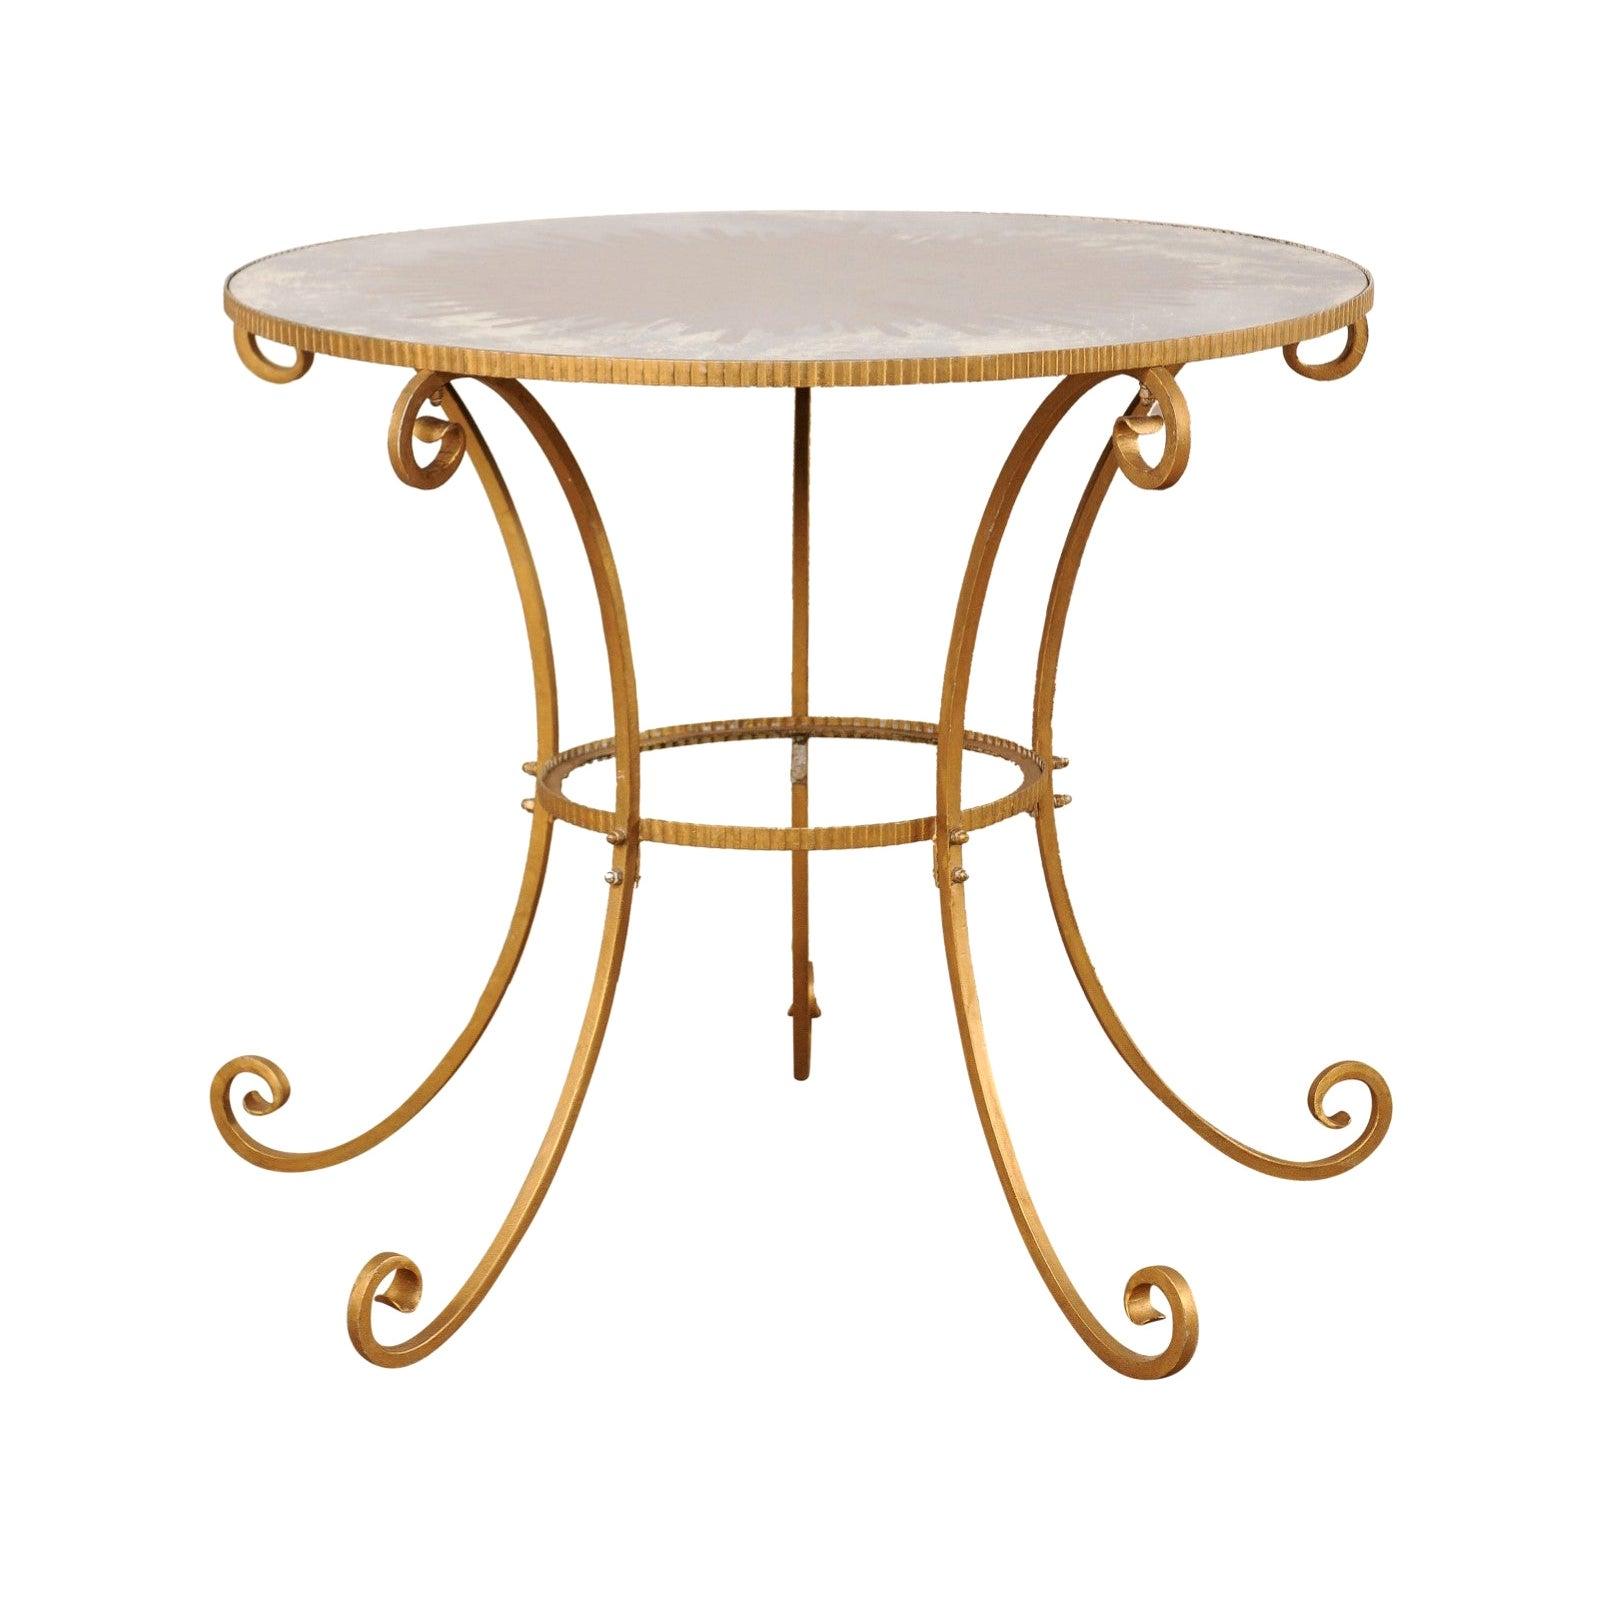 Midcentury American Tall Center Table with Églomisé Sunburst Mirrored Top